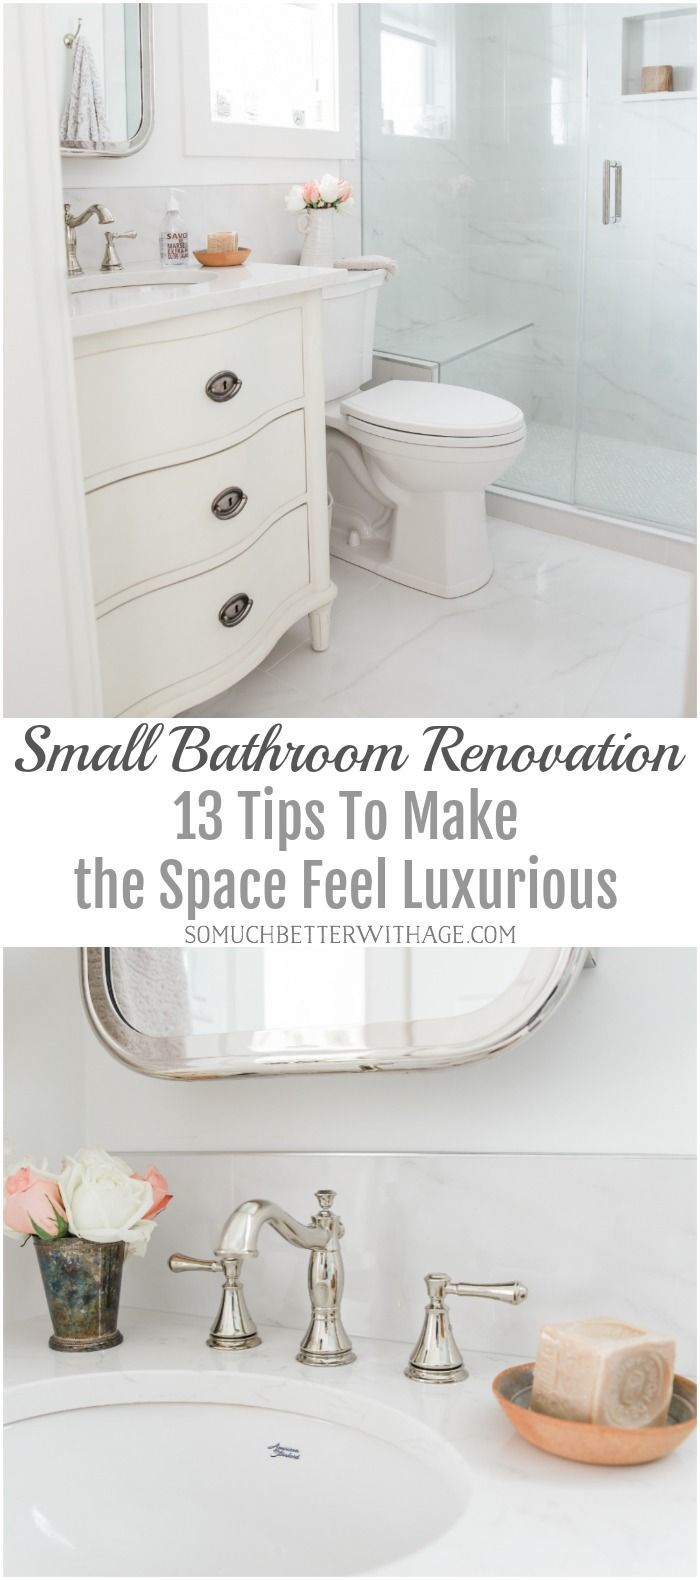 Small Bathroom Renovation And 13 Tips To Make It Feel Luxurious Small Bathroom Renovation Small Bathroom Renovations Top Bathroom Design